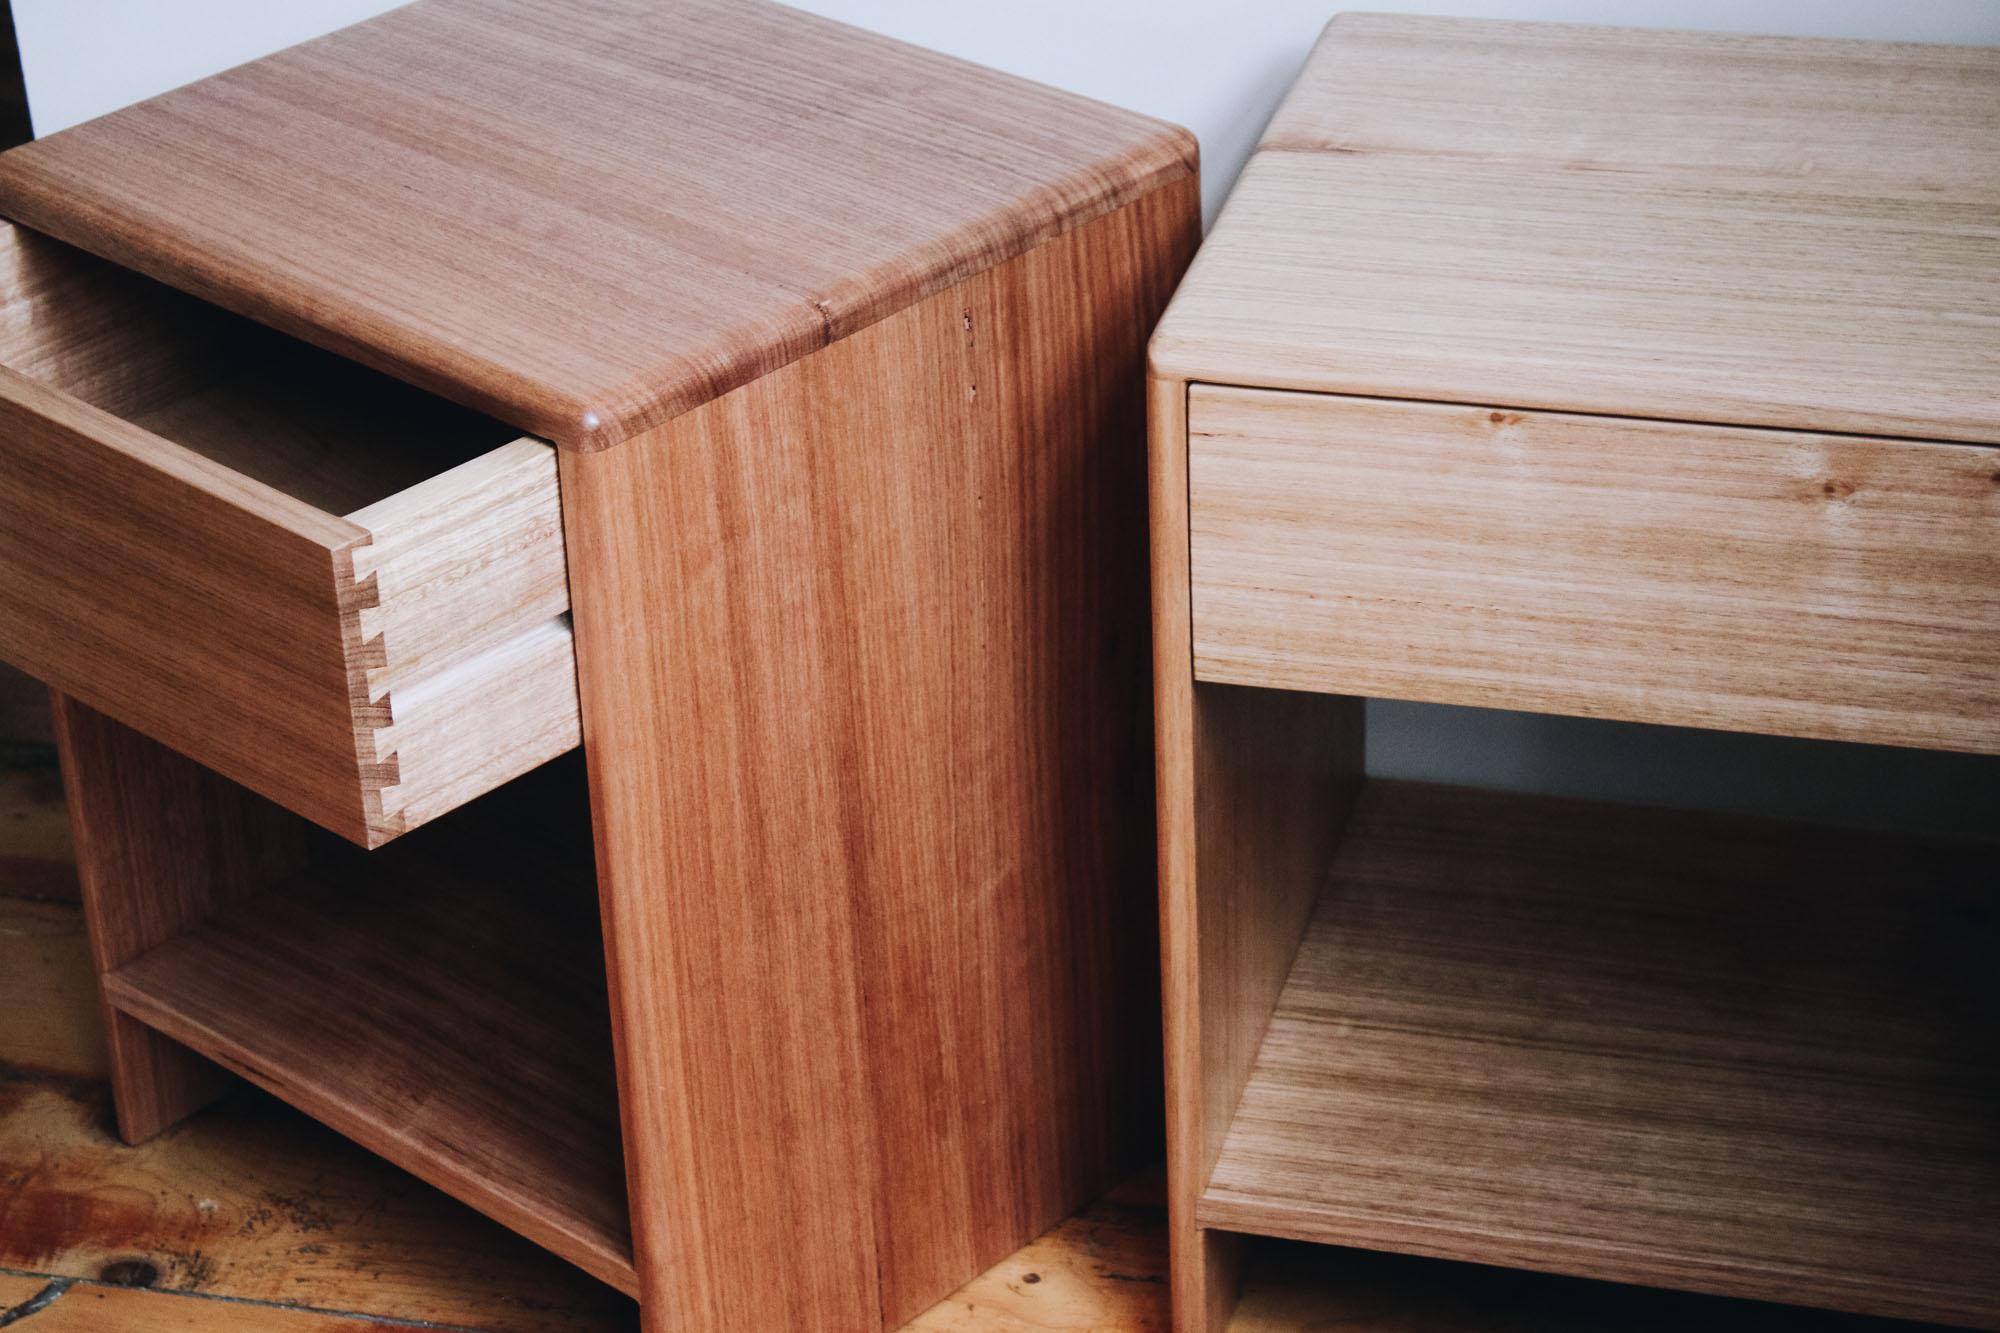 Al and Imo Handmade - Low Bedside Tables - Custom minimalst timber side drawer - Melbourne - Surf Coast - Australia-6.jpg